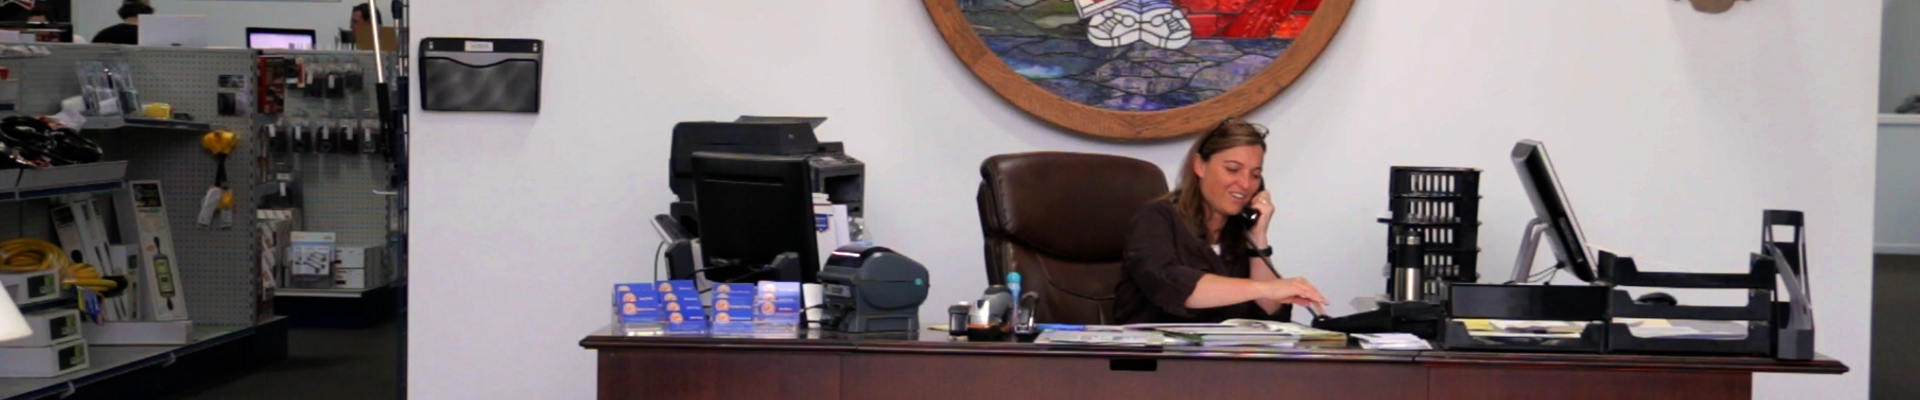 front-desk-customer-service-at-lakeshore-rv